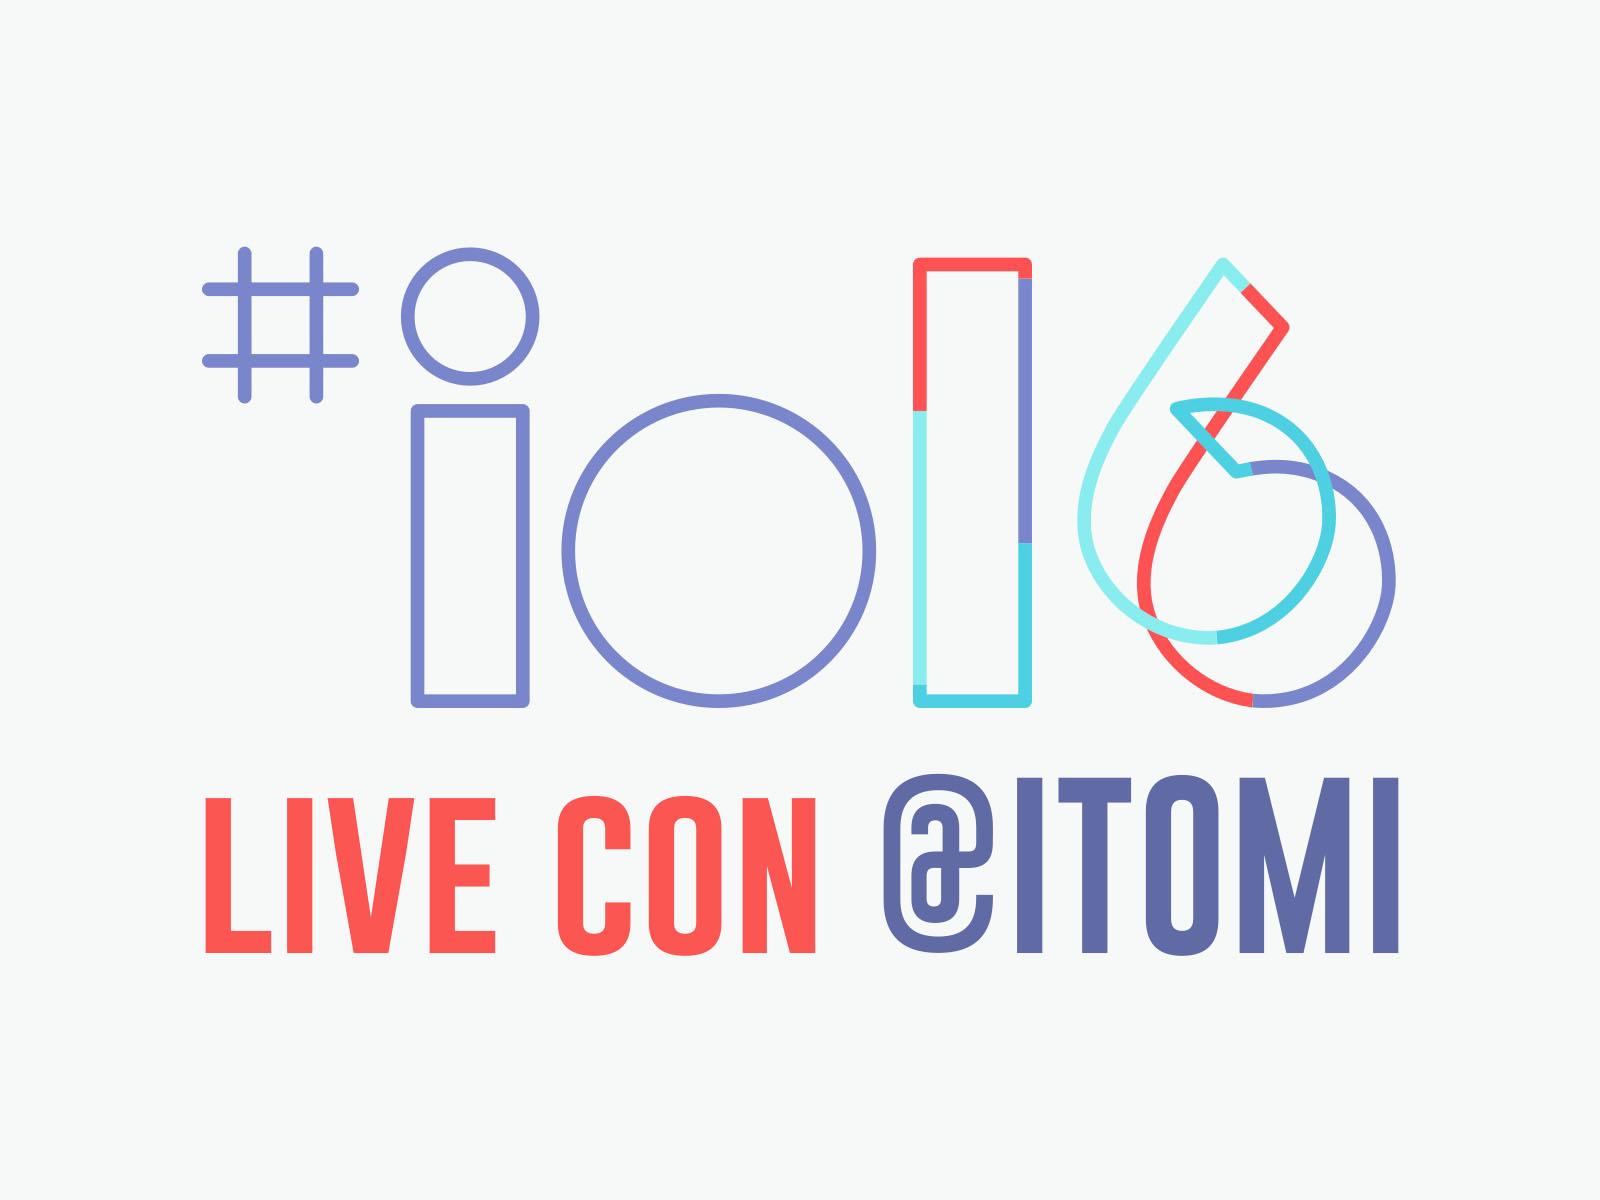 Google I/O 2016 Live con Itomi